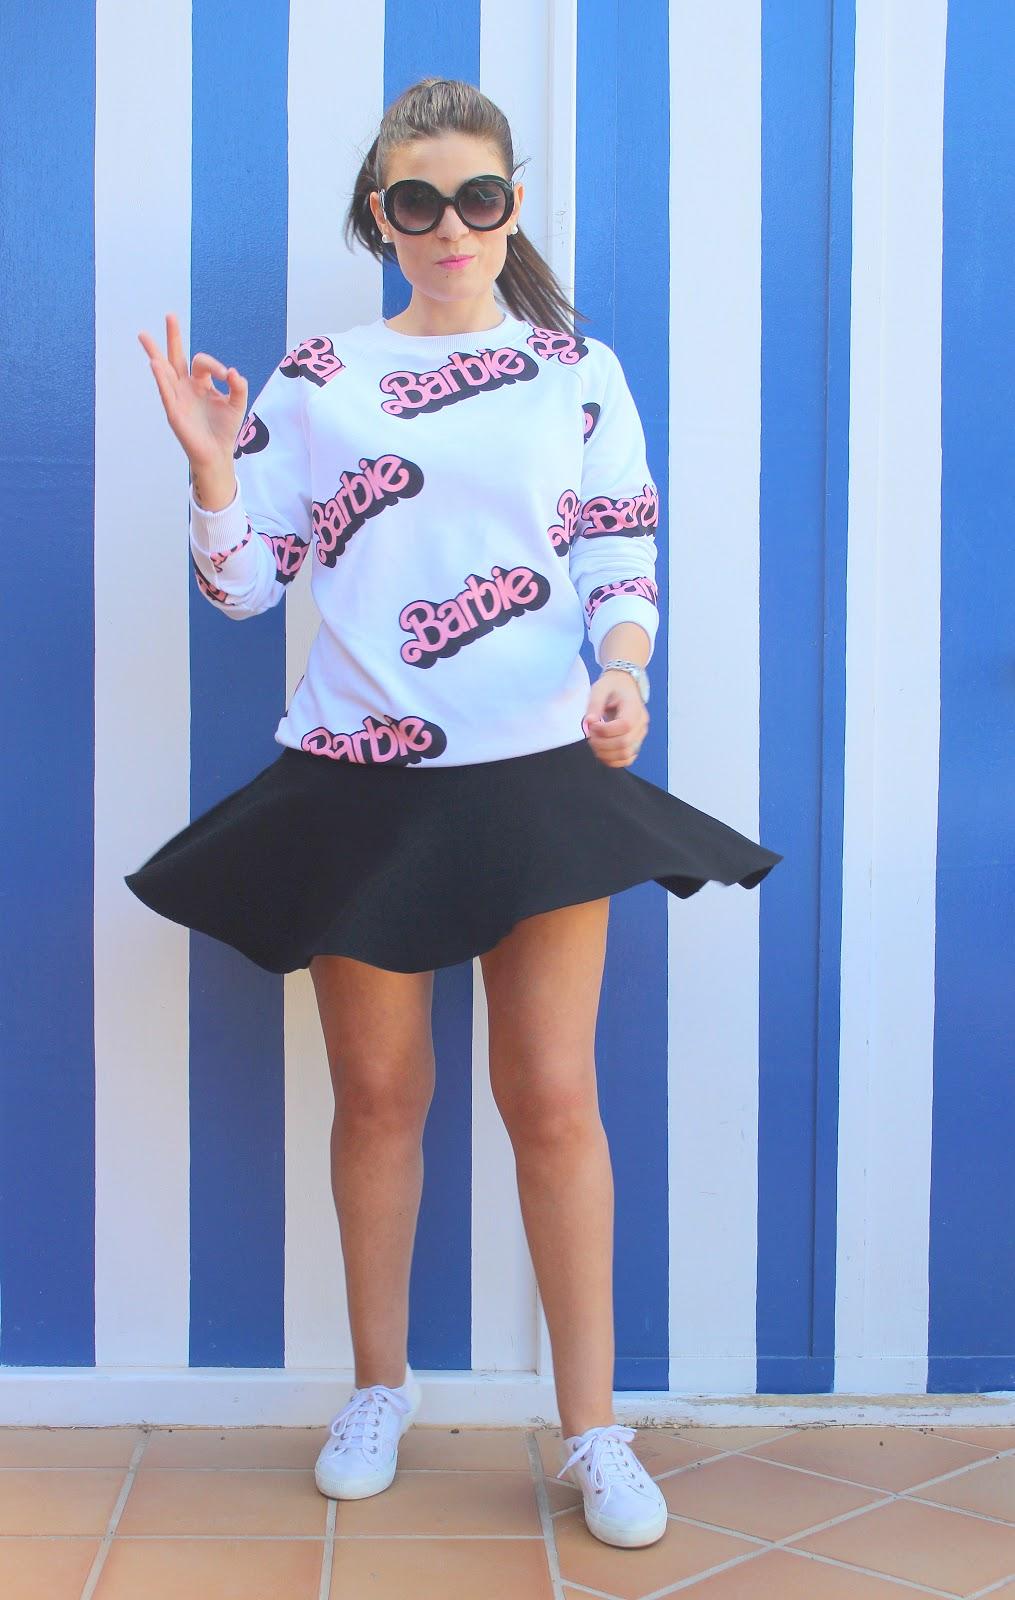 Barbie_Girl_The_Pink_Graff_04